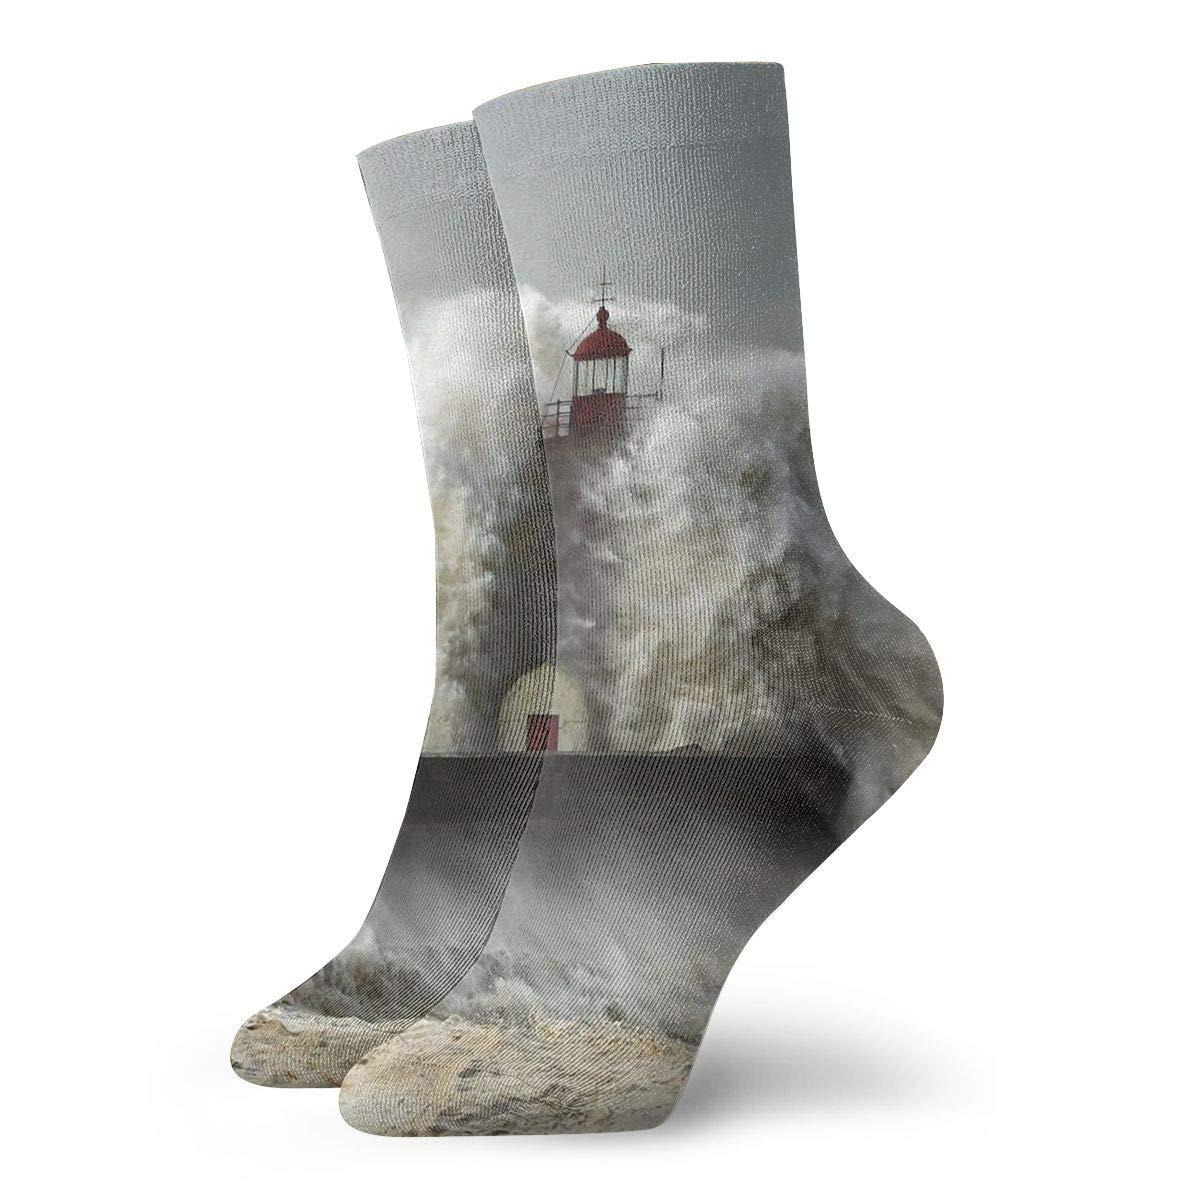 Unisex High Ankle Cushion Crew Socks Sea Waves Casual Sport Socks